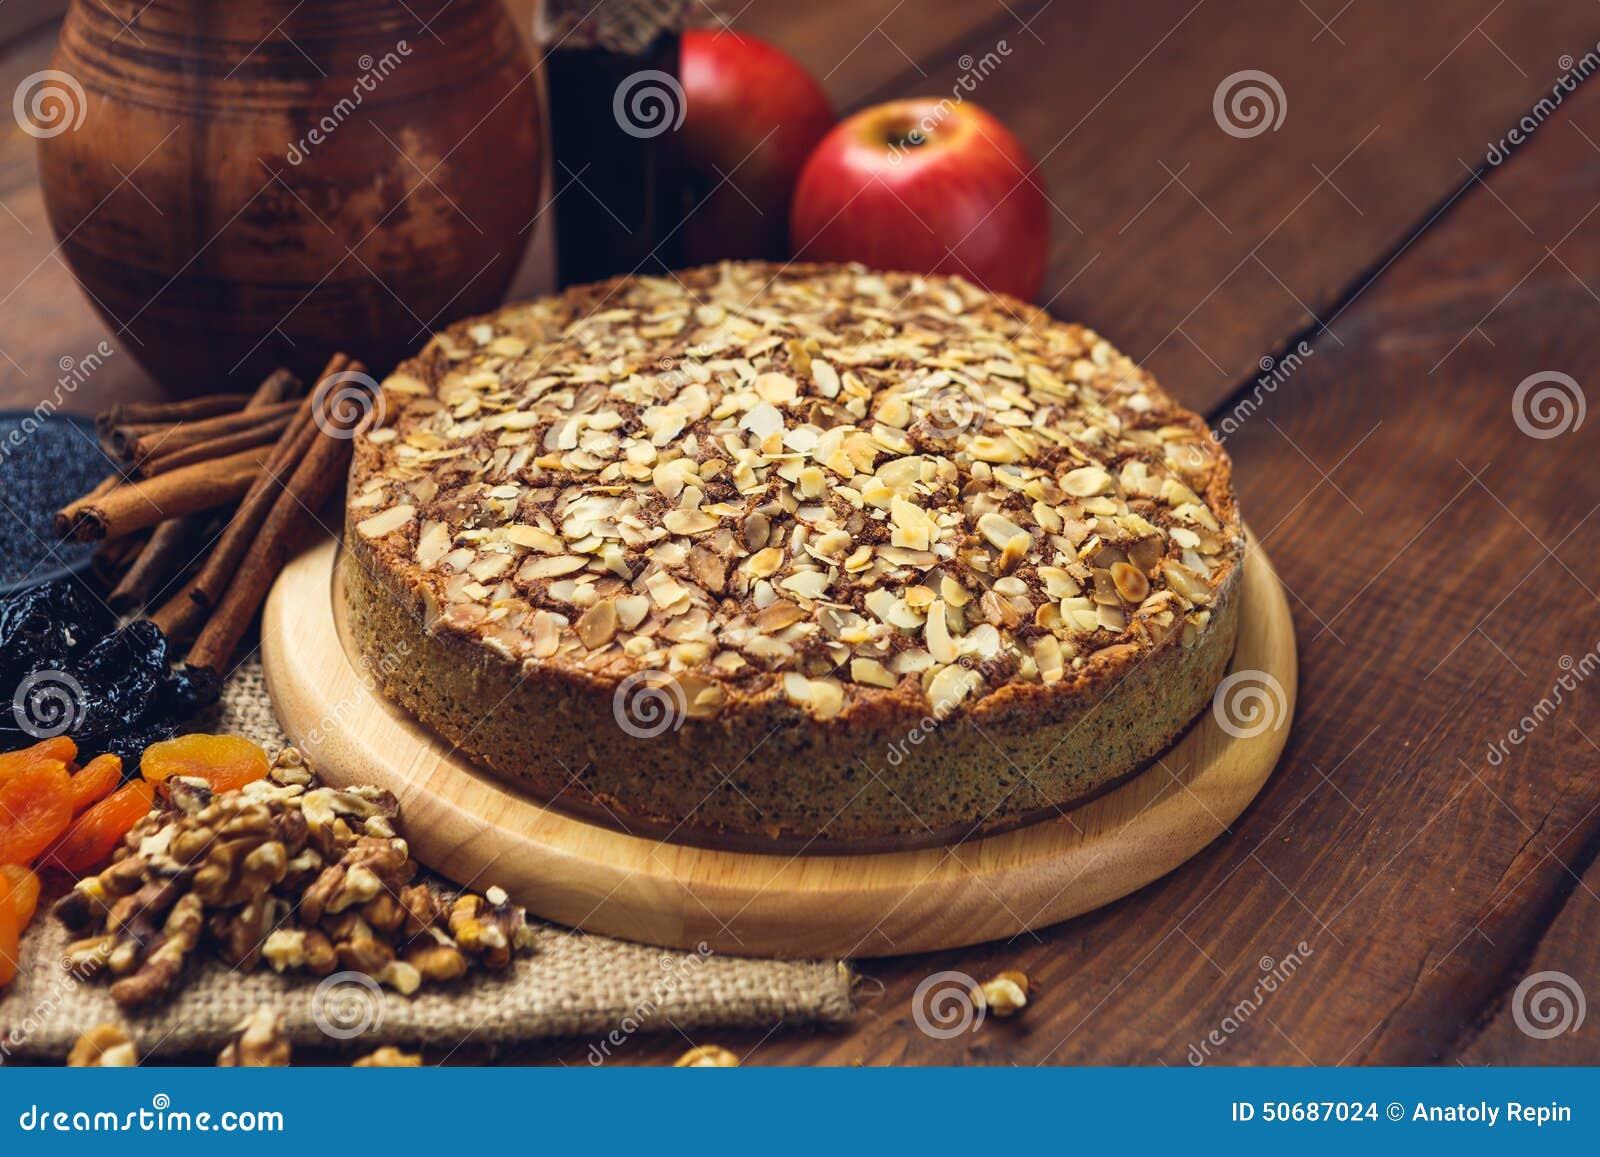 Download 与罂粟种子和杏仁的自创饼剥落 库存照片. 图片 包括有 吃饭的客人, 厨房, 自然, 烹调, 来回, 部分 - 50687024